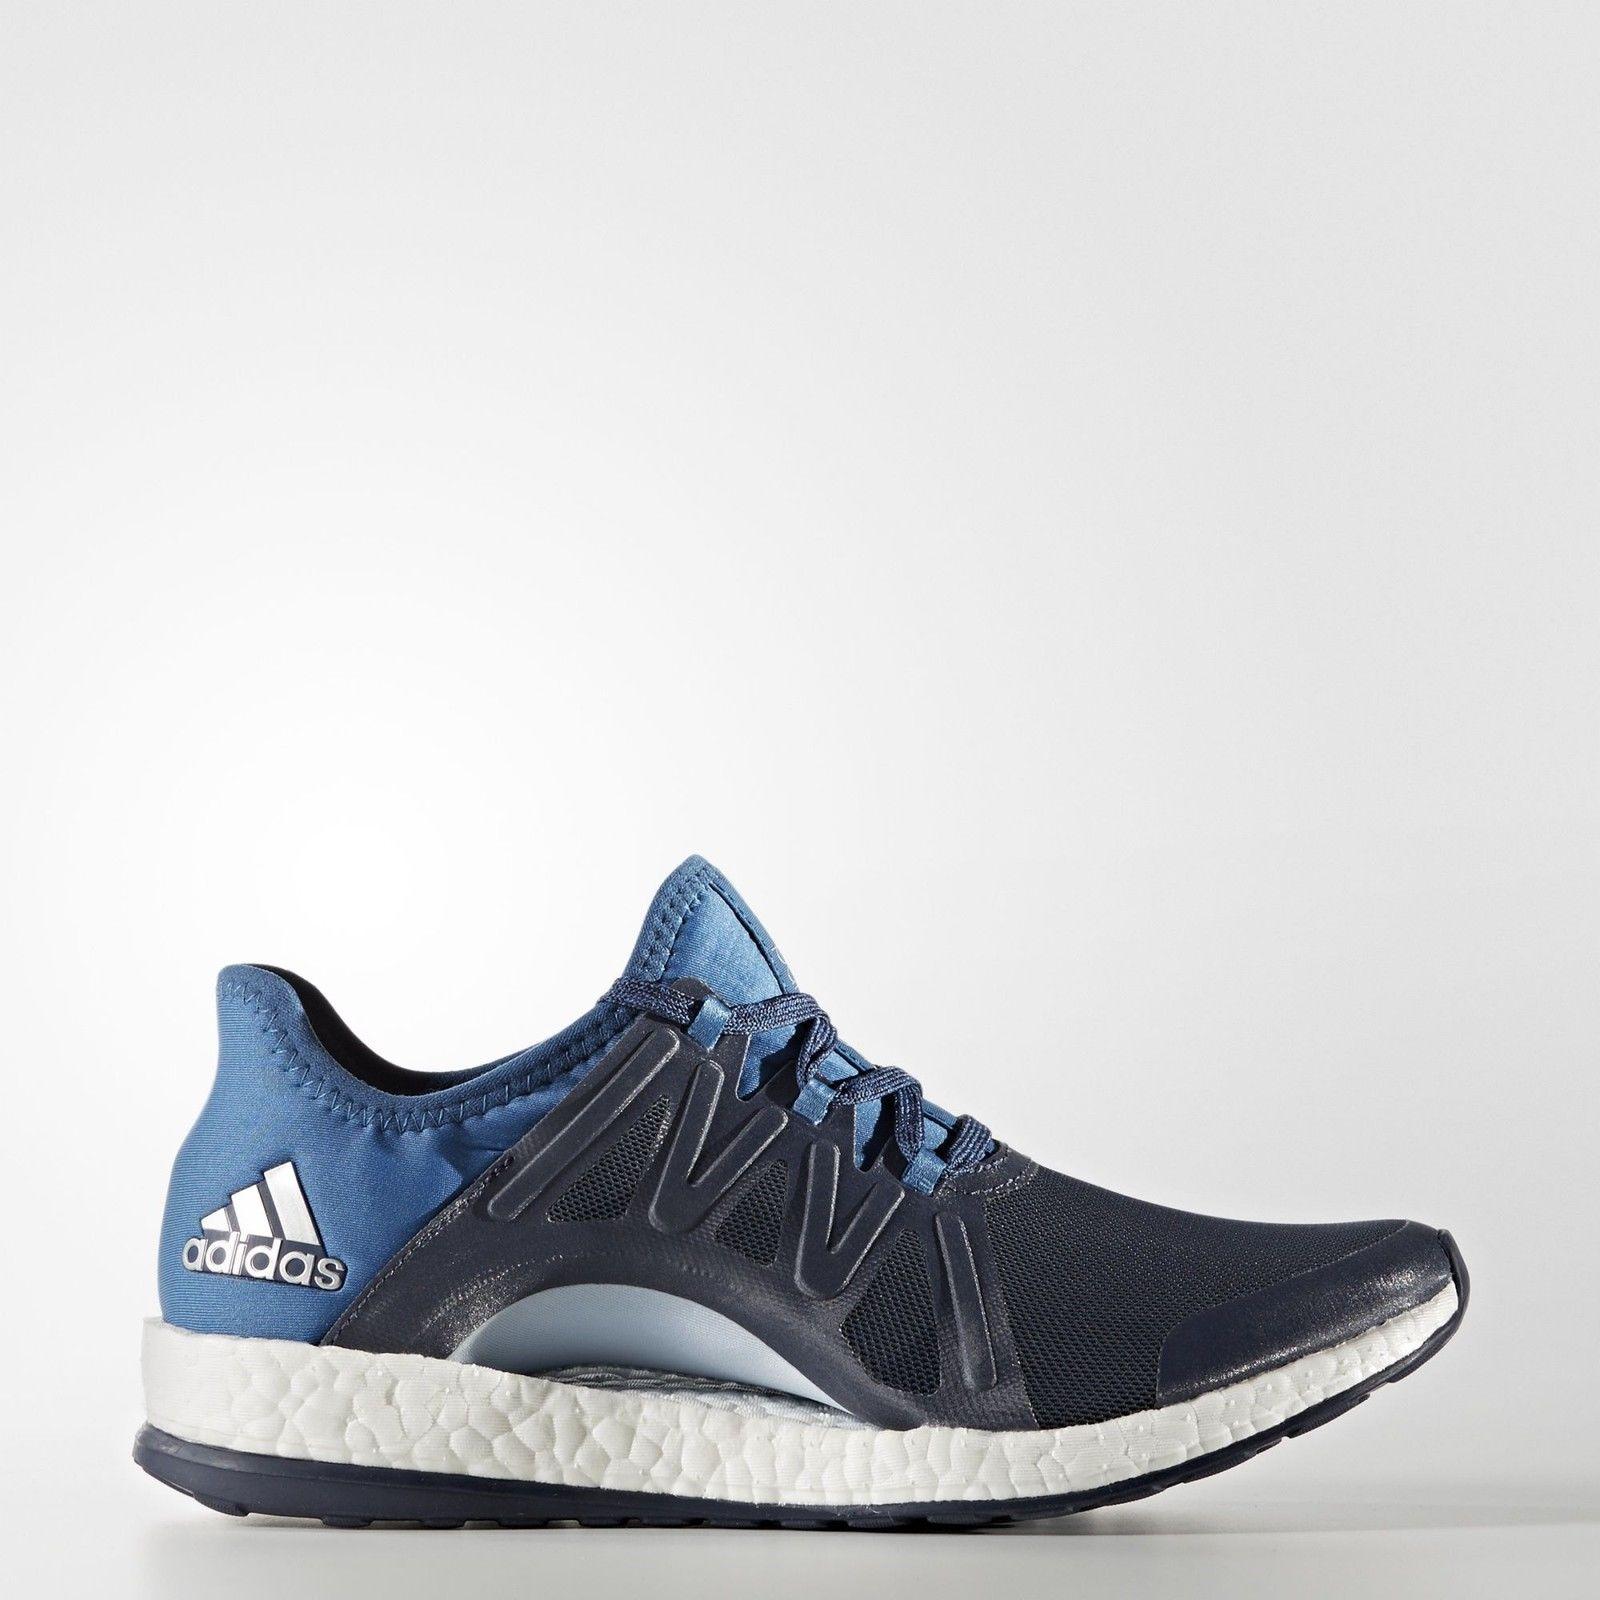 adidas uomini scarpe da corsa da